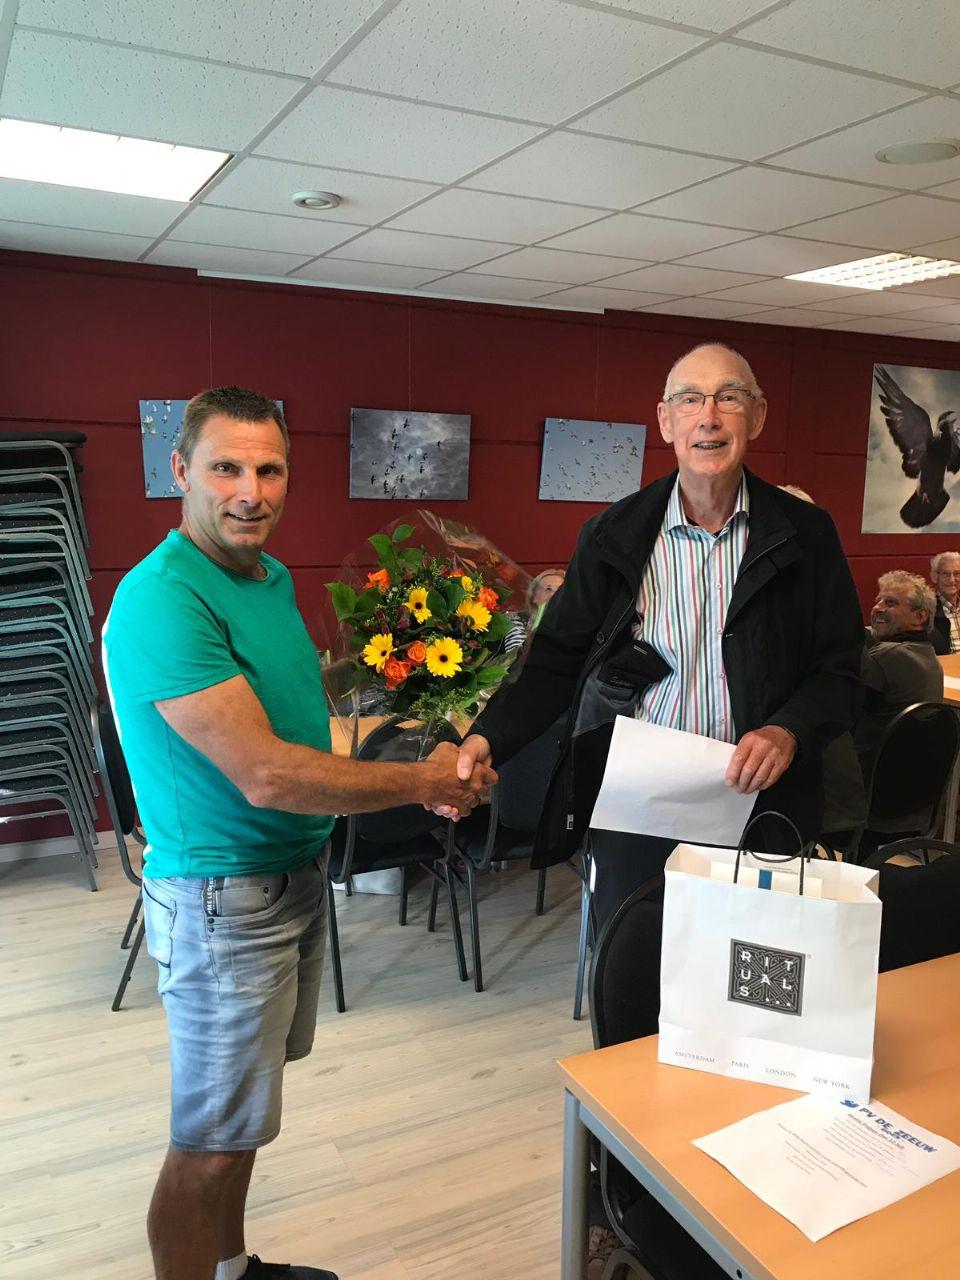 Francois wint Melun